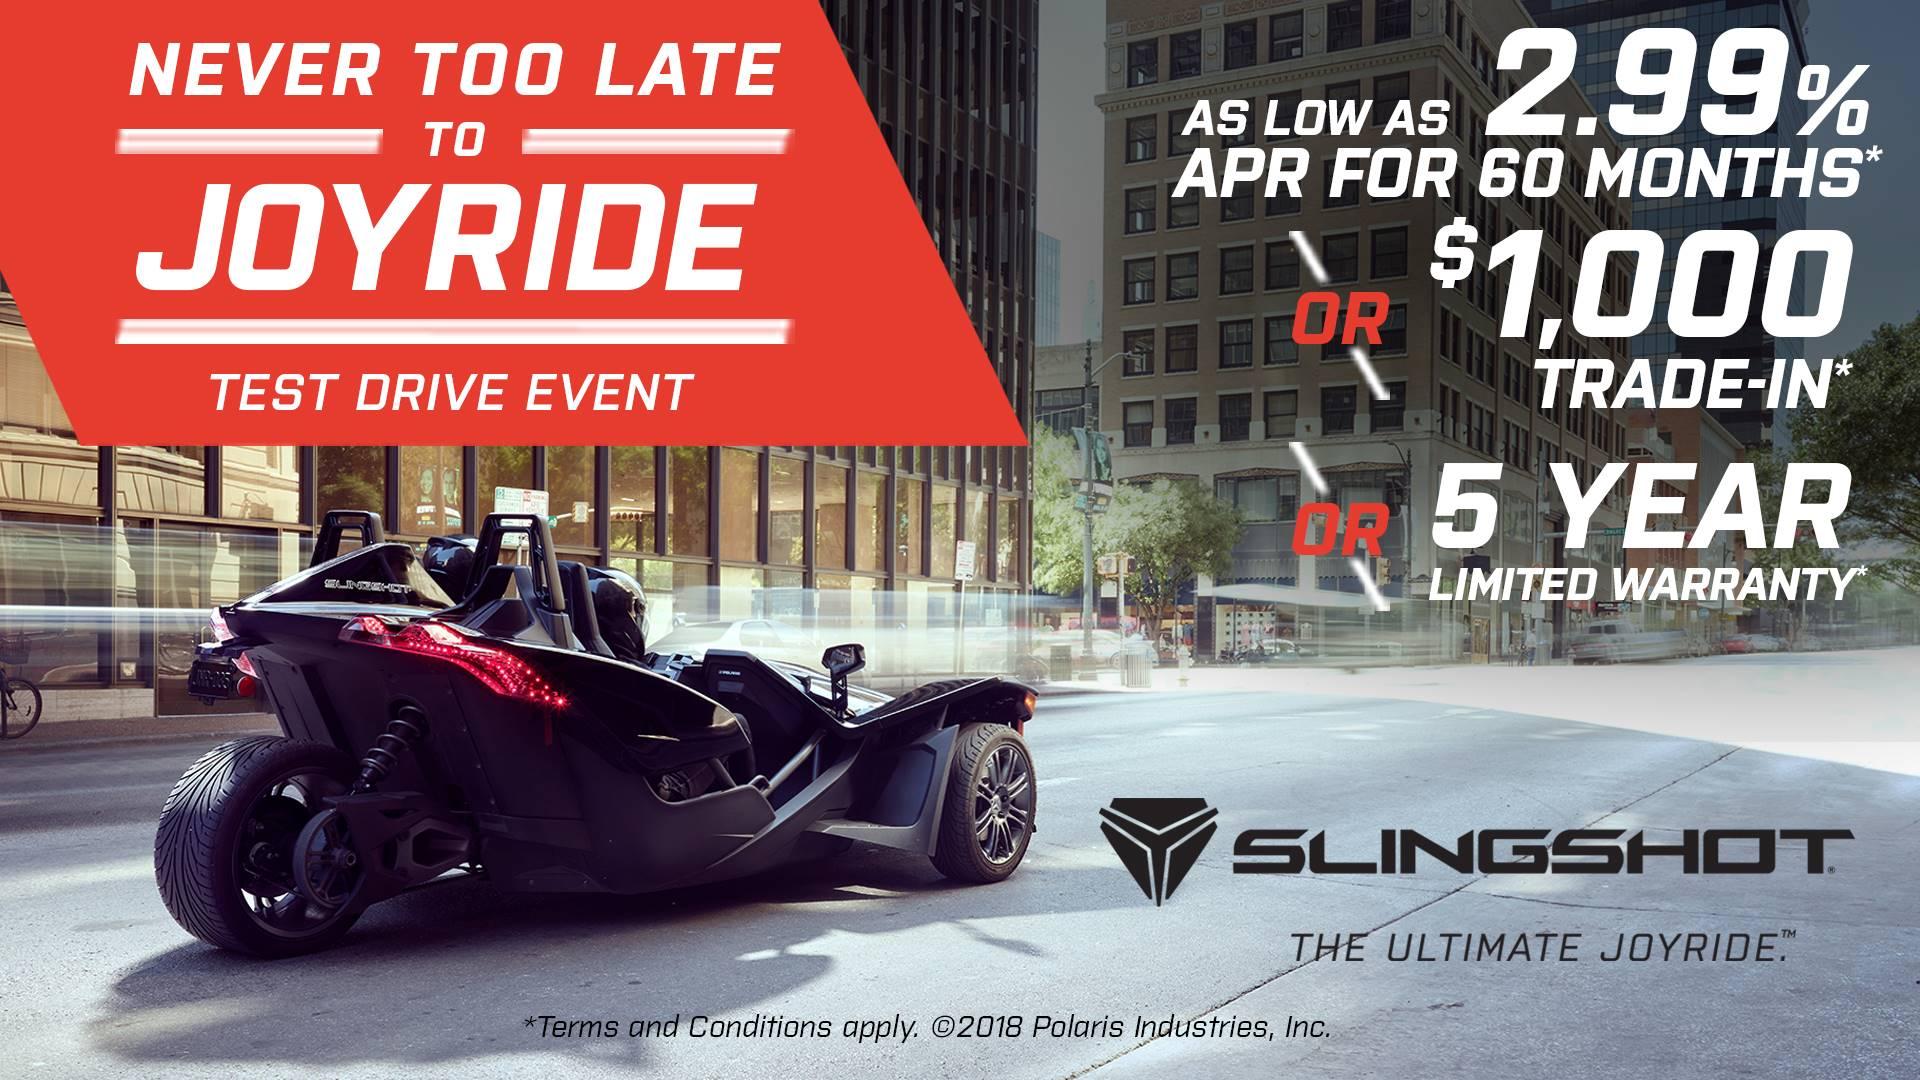 Slingshot - Never Too Late to JOYRIDE Test Drive Event